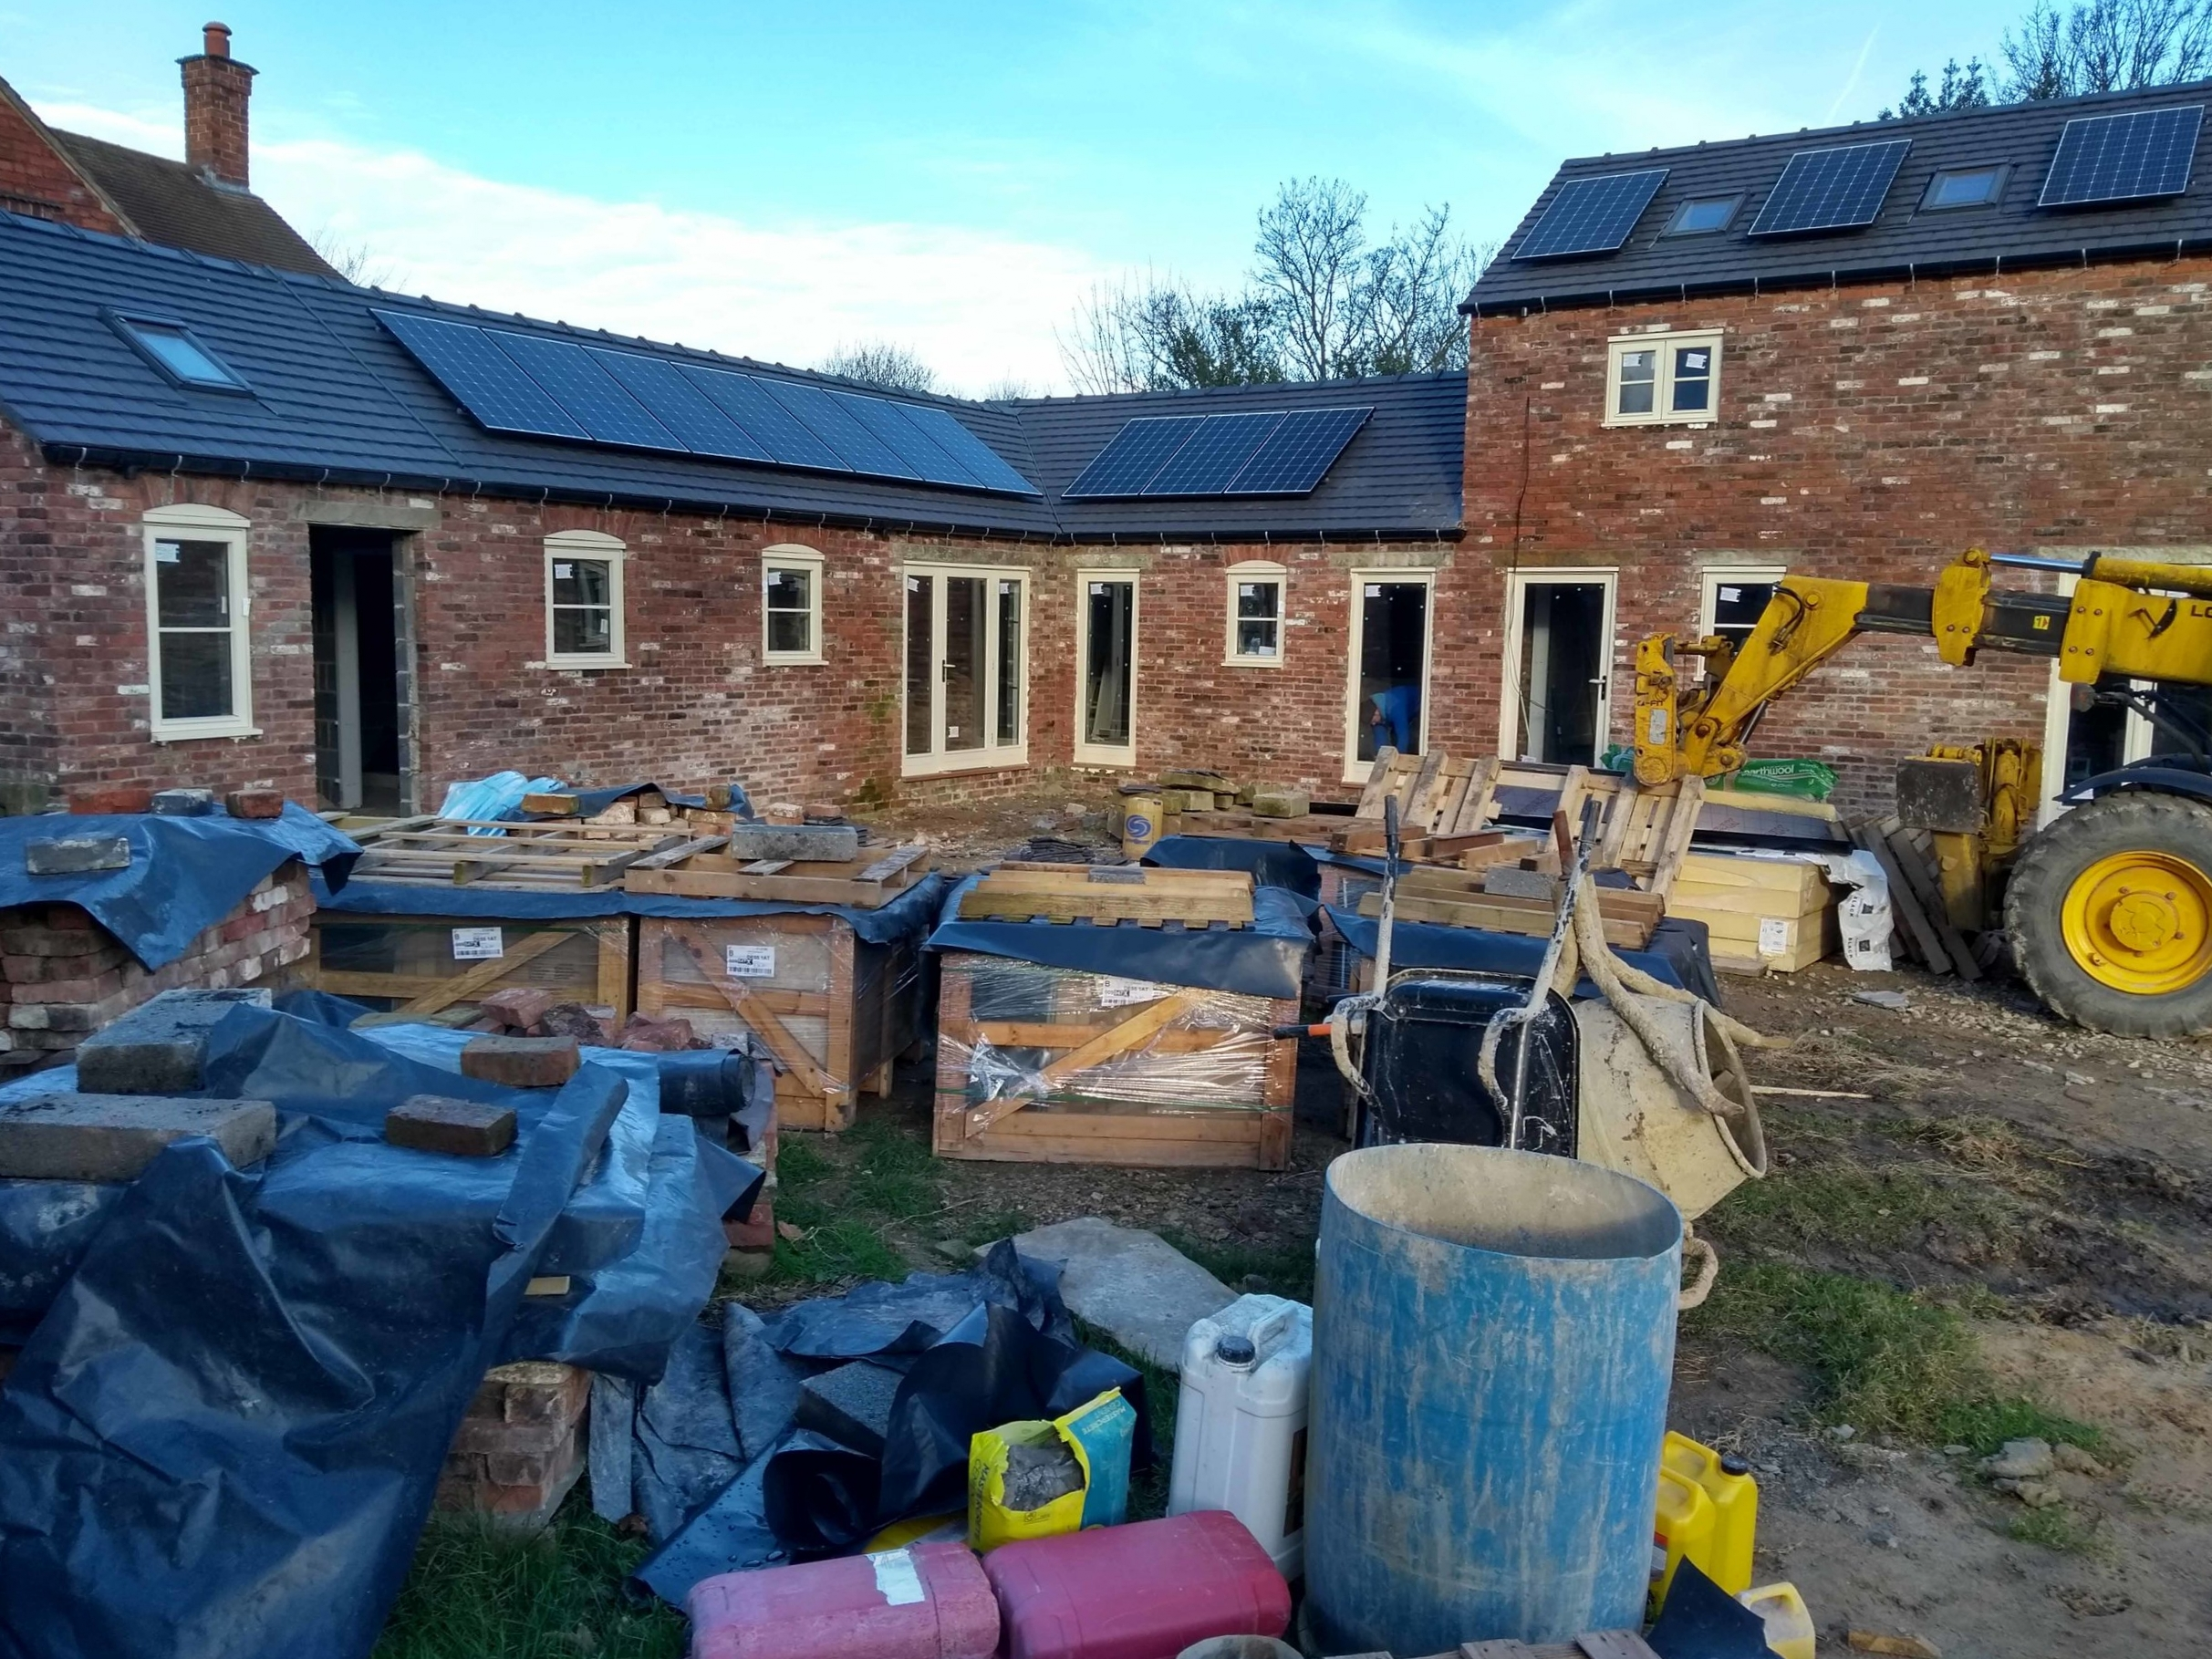 Barn 1 windows and solar pv